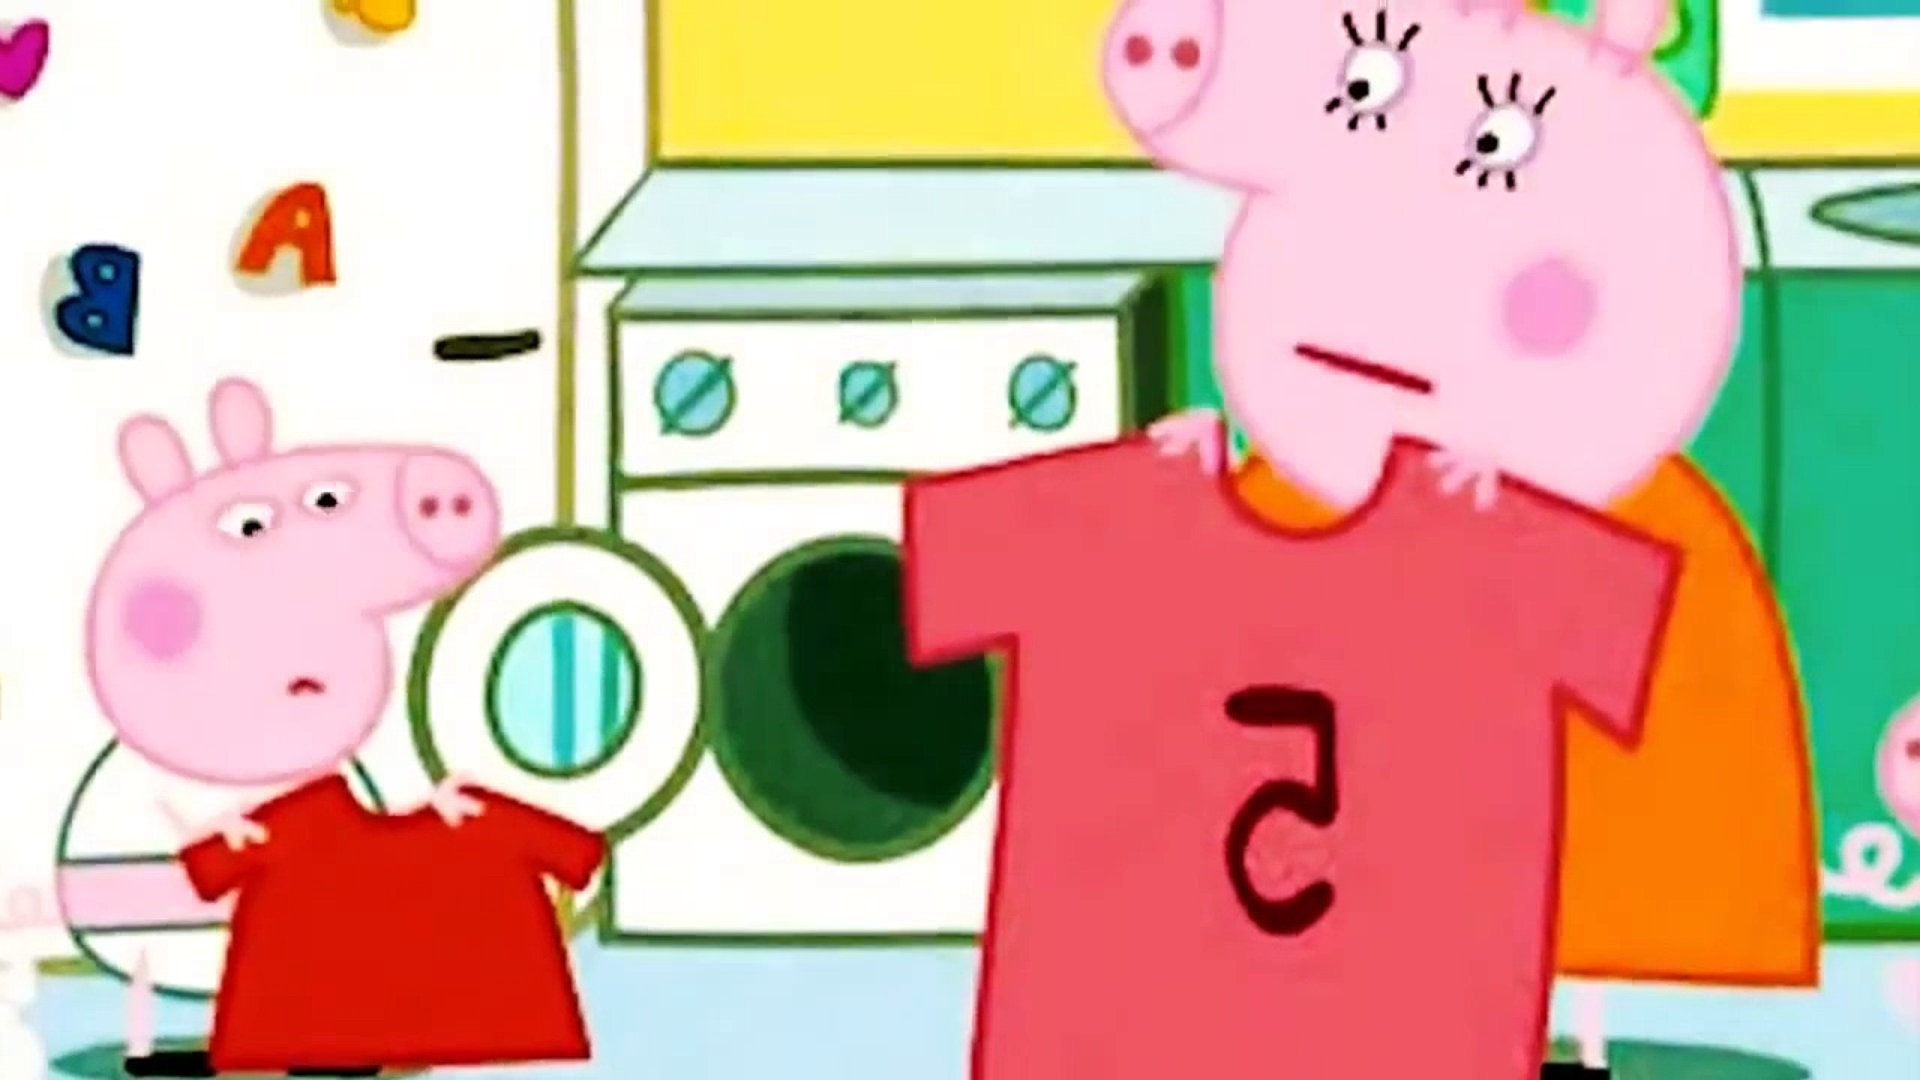 cochon peppa en francais